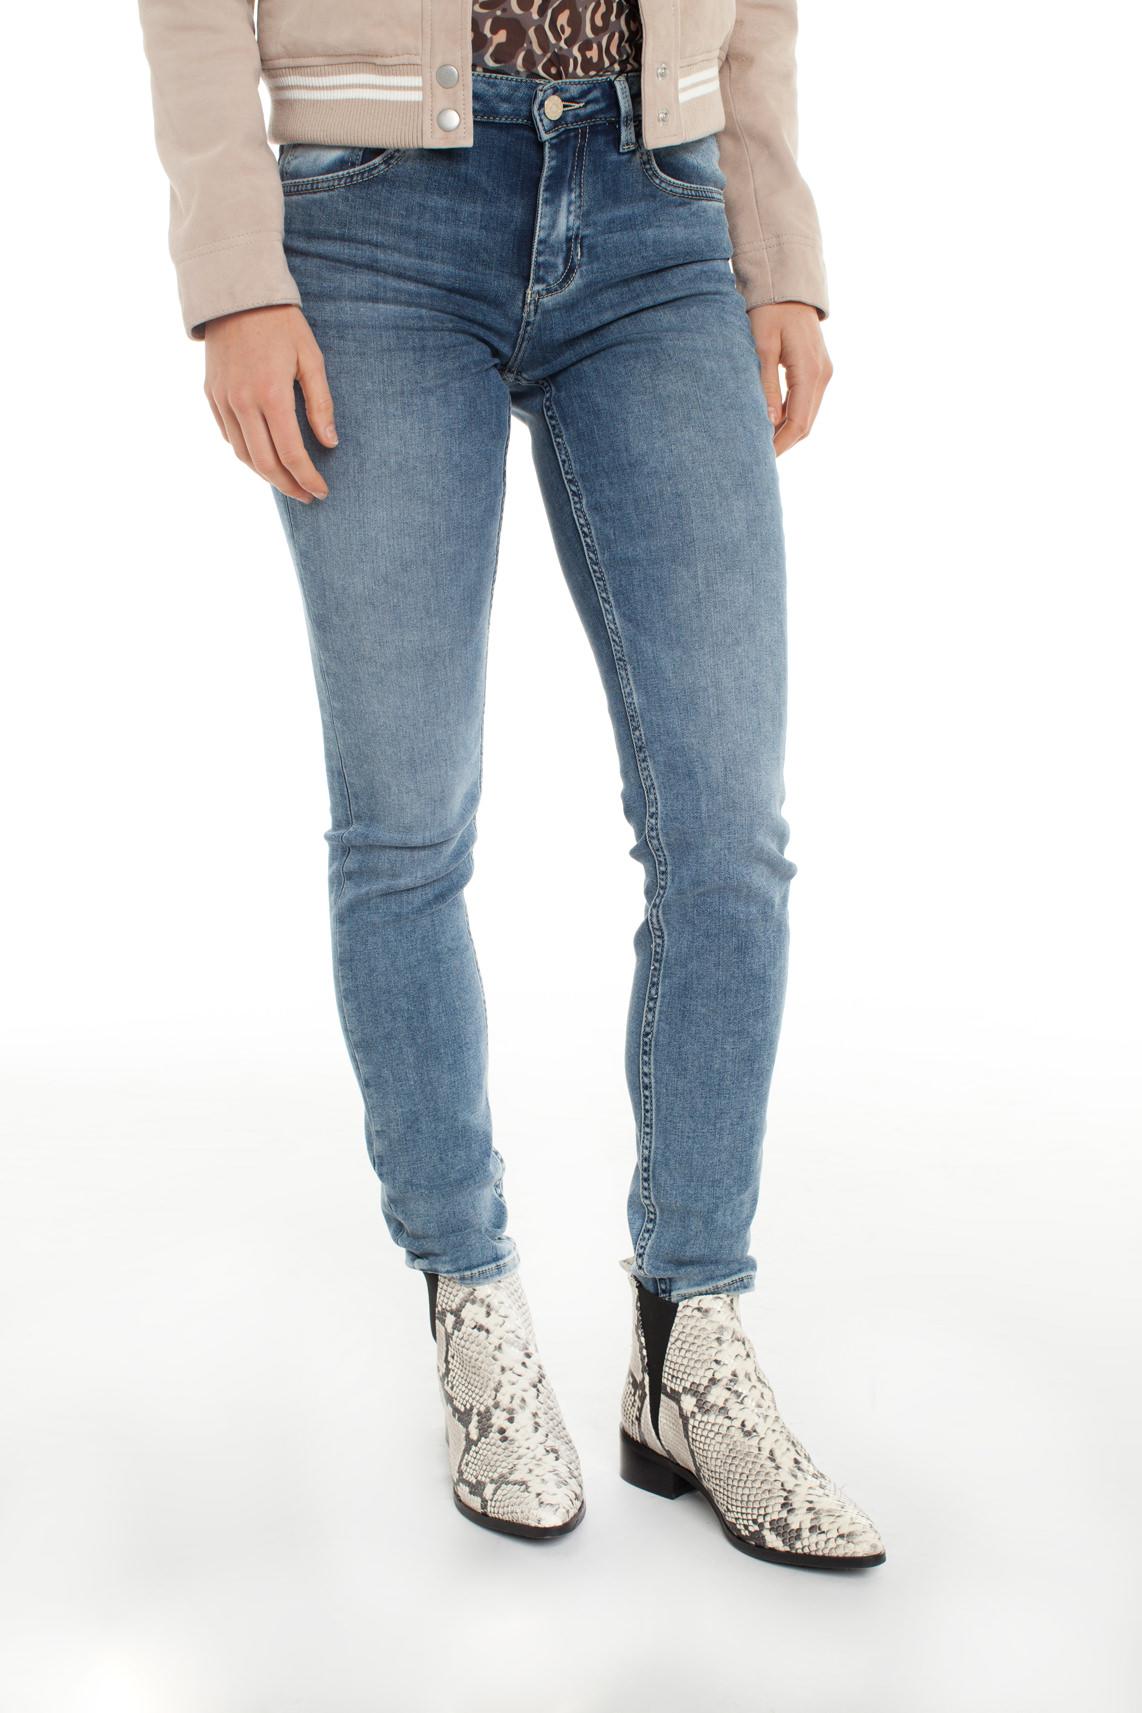 Rosner Dames Antonia gebleekte jeans Blauw